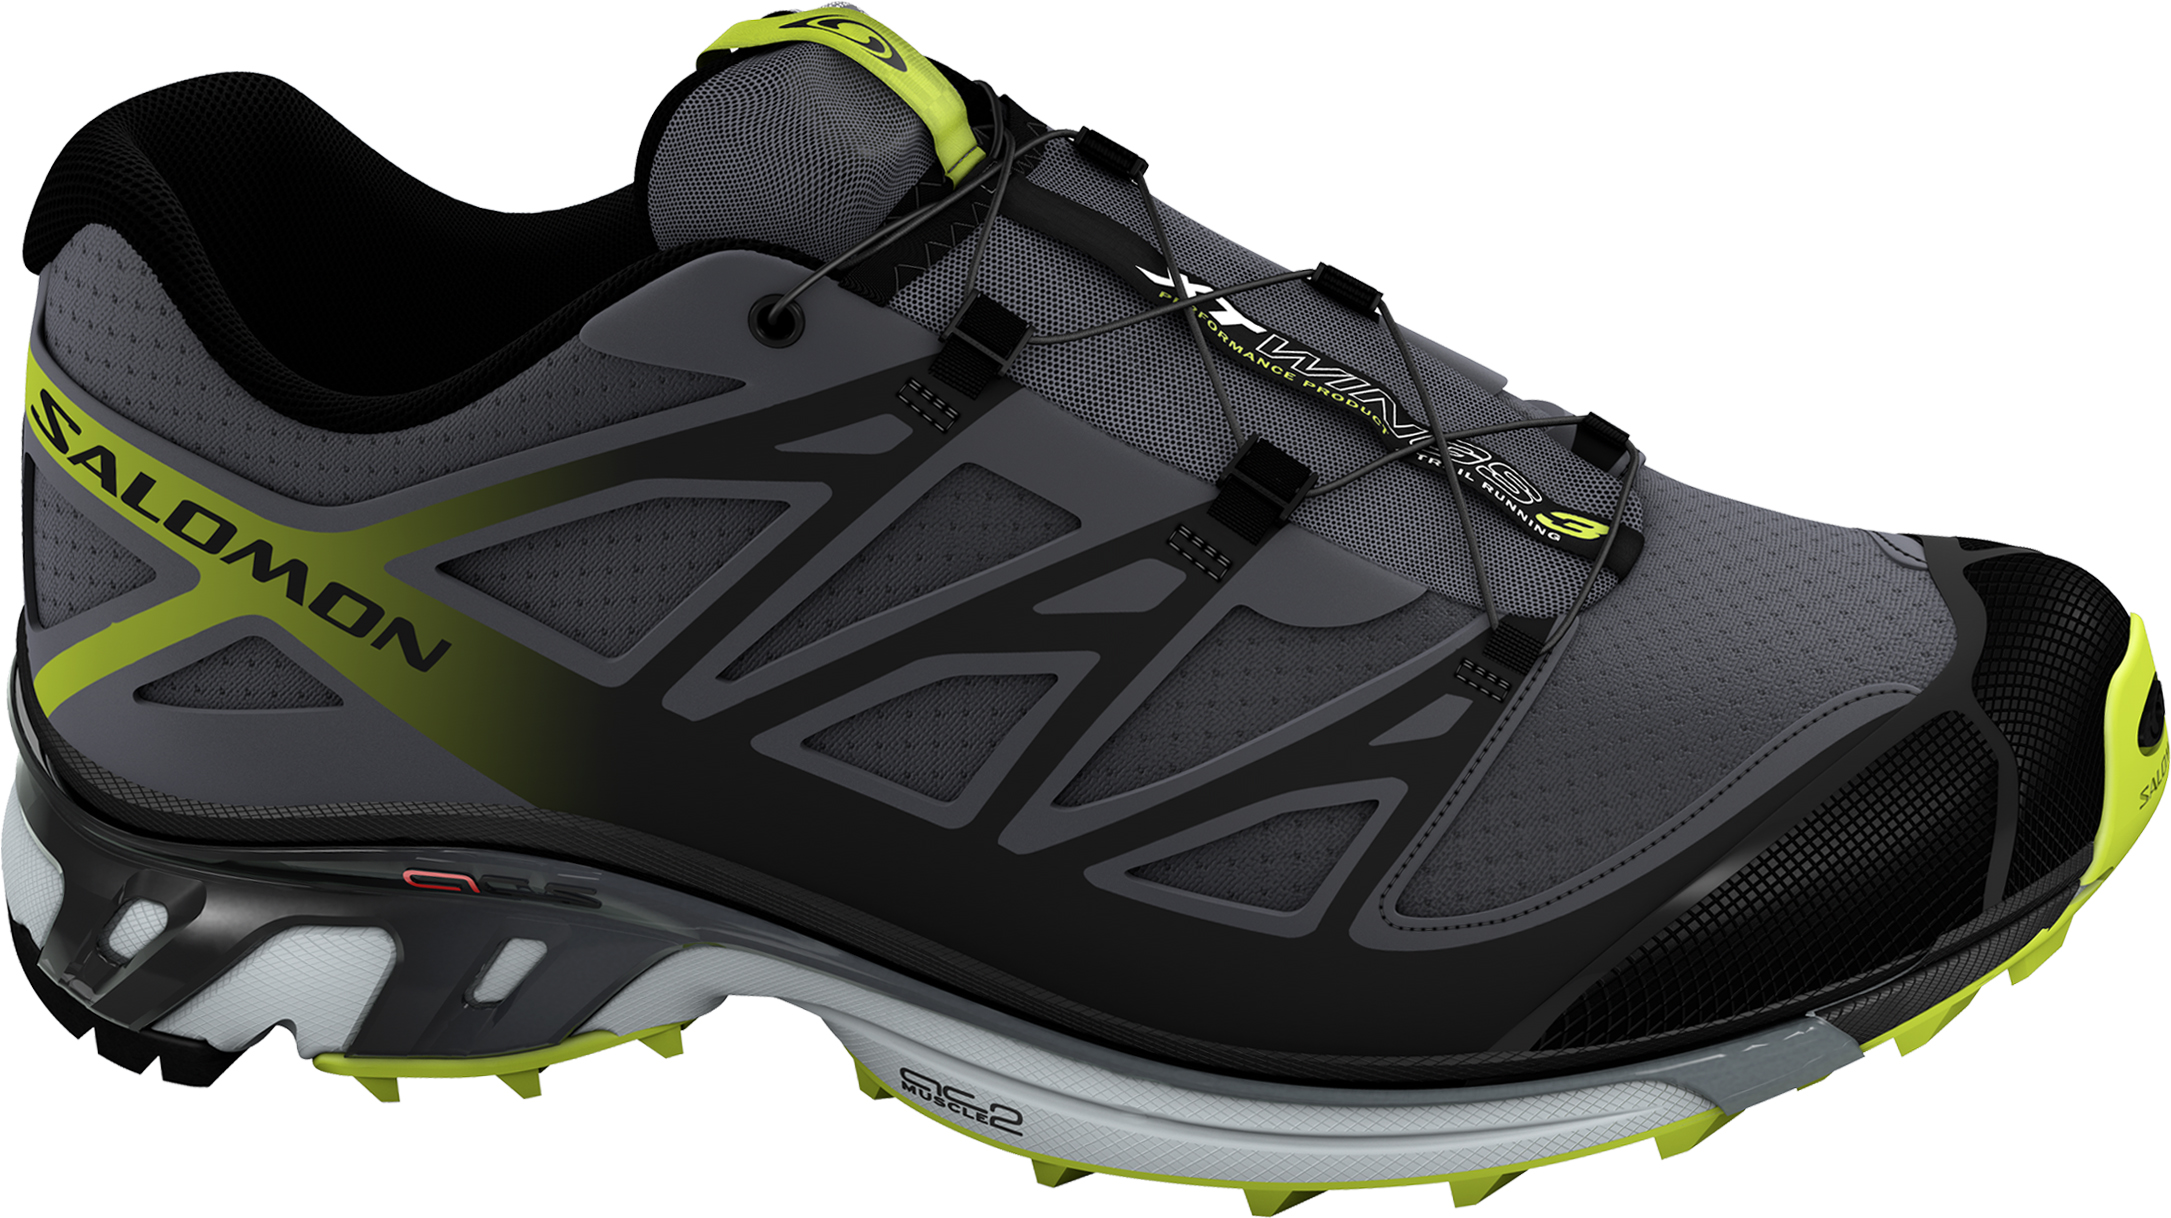 Running Trail Review Salomon Mens Inari Xt Shoes PXikZu